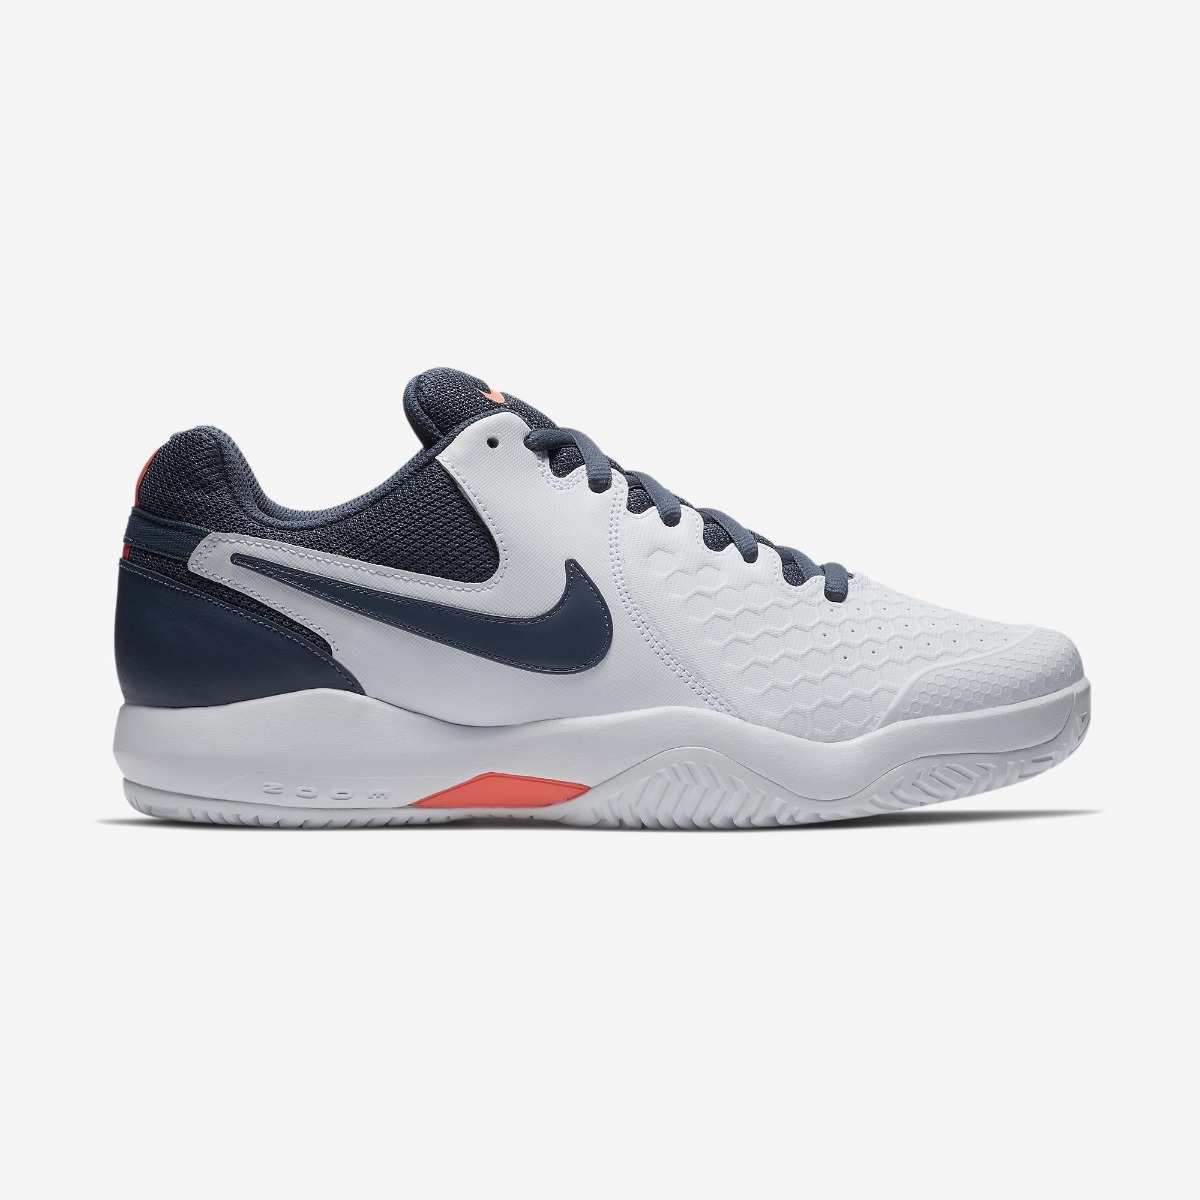 081f8ba2a7234 Tênis Nikecourt Air Zoom Resistance Tennis